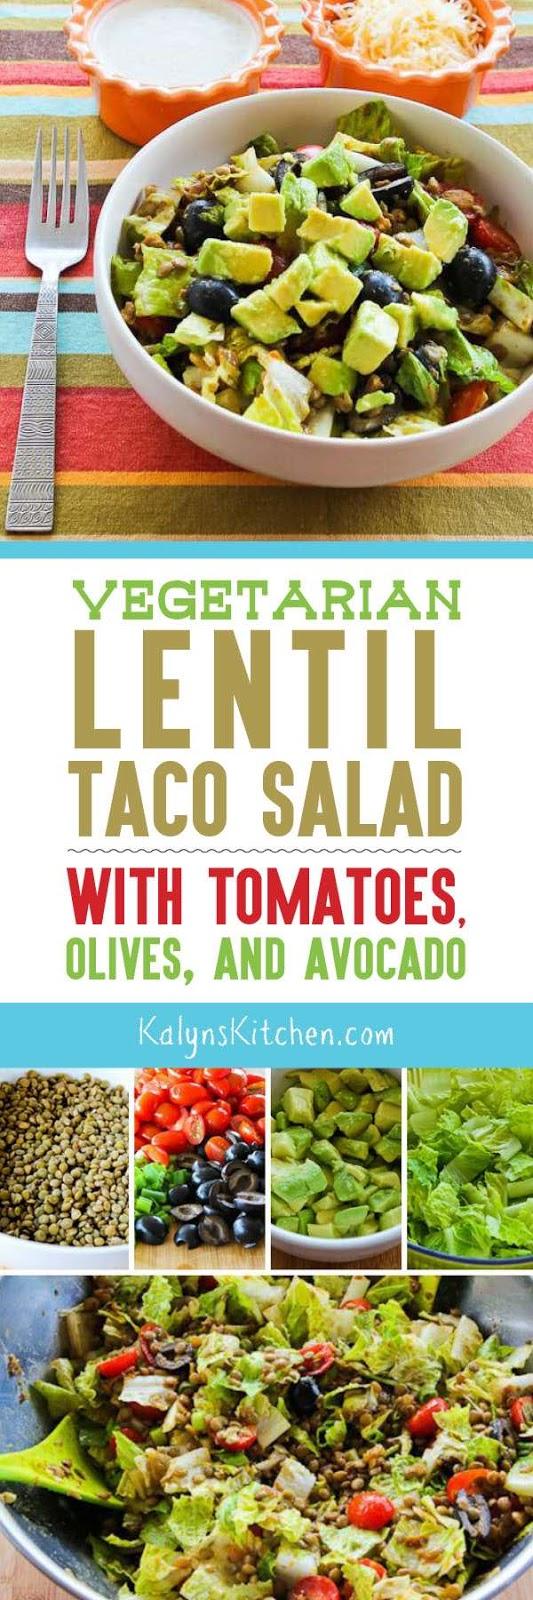 Kalyn's Kitchen®: Vegetarian Lentil Taco Salad with Tomatoes, Olives ...